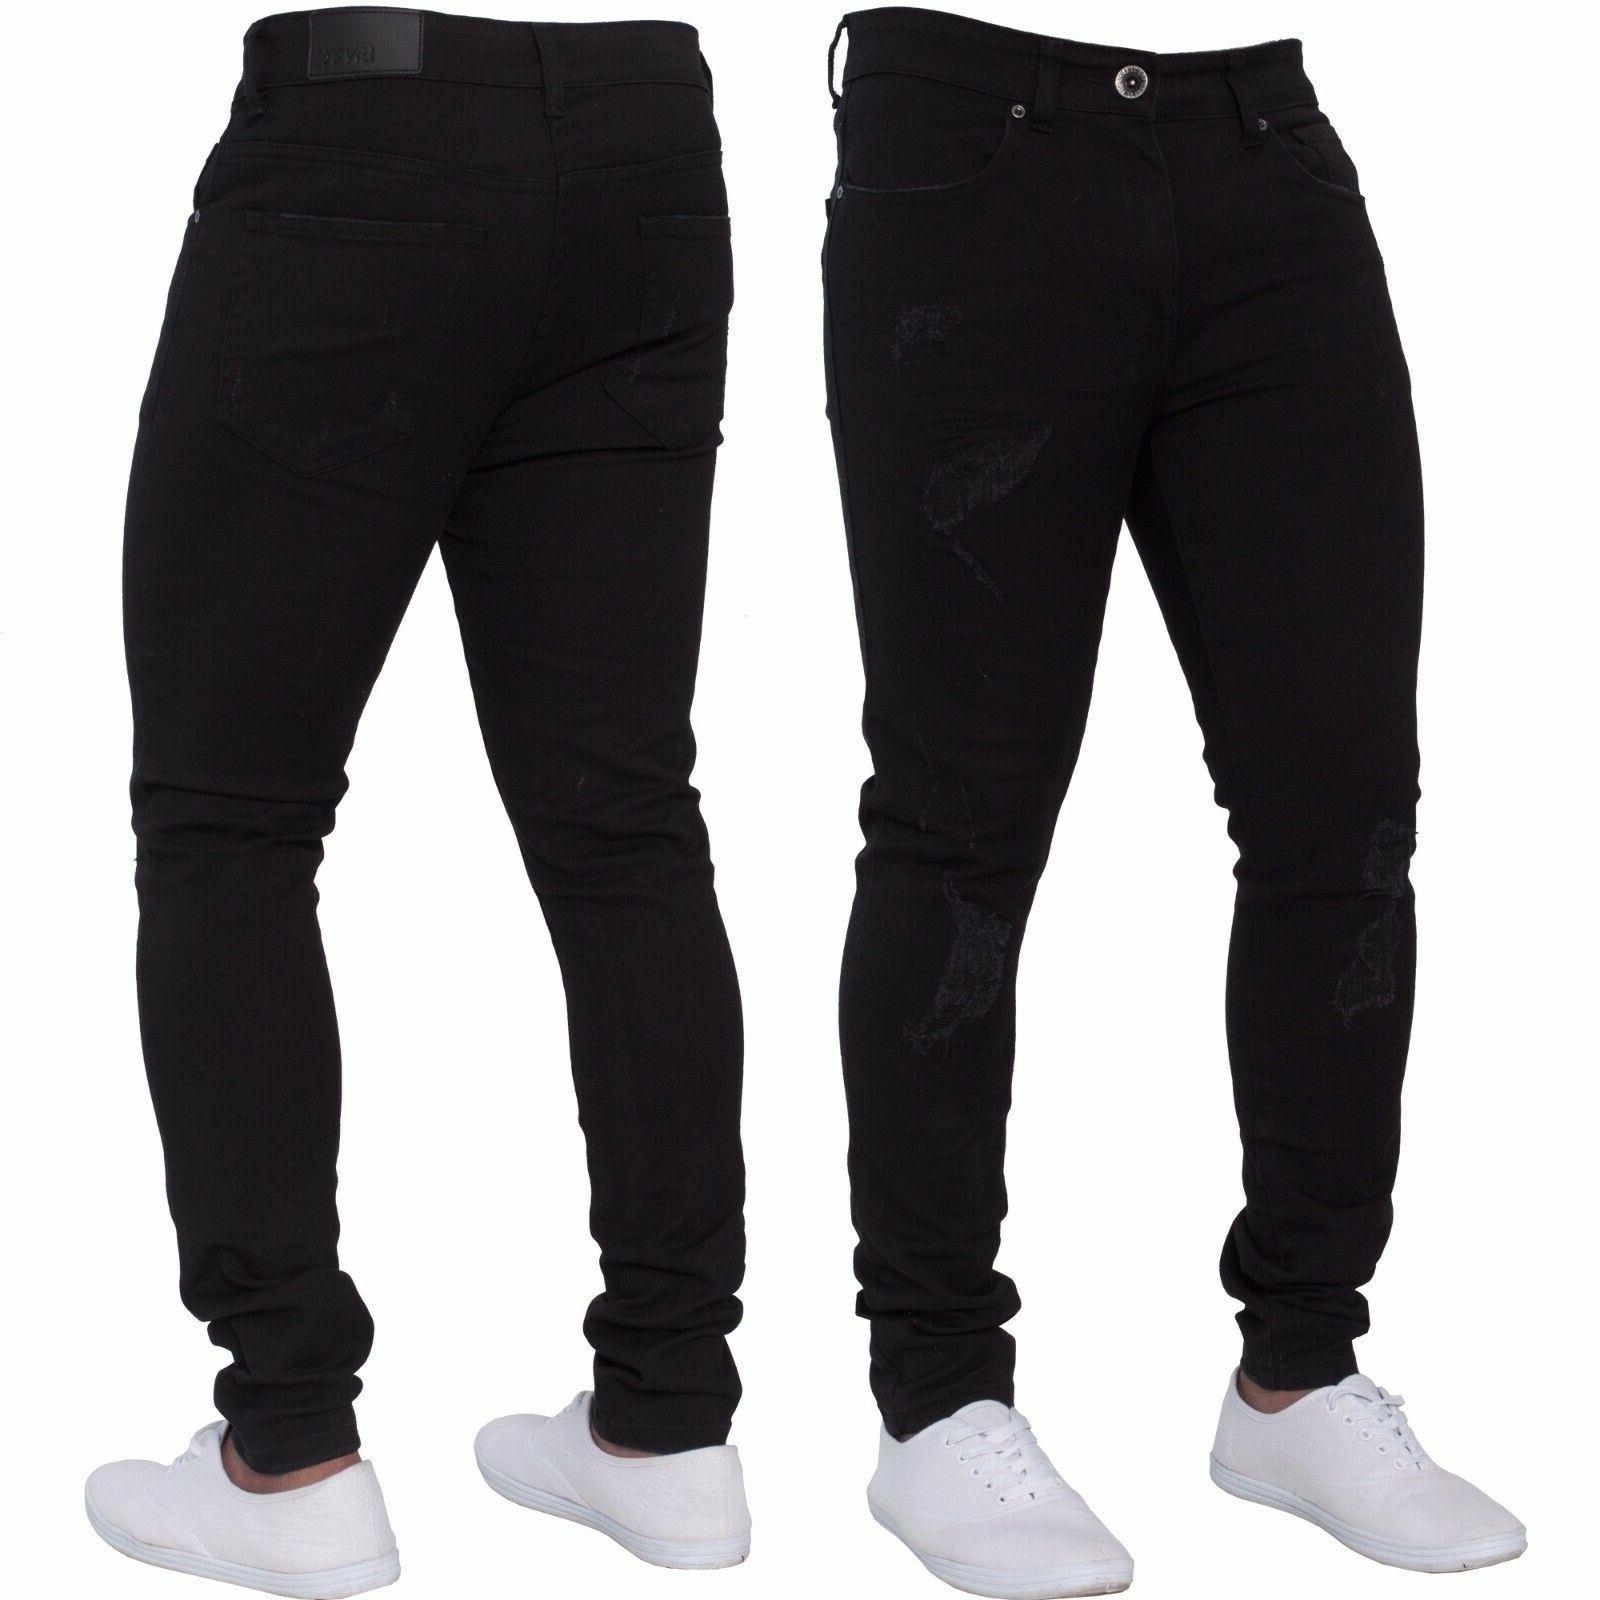 Men's Fashion Stretch Jeans Fitness Denim Trousers Pants